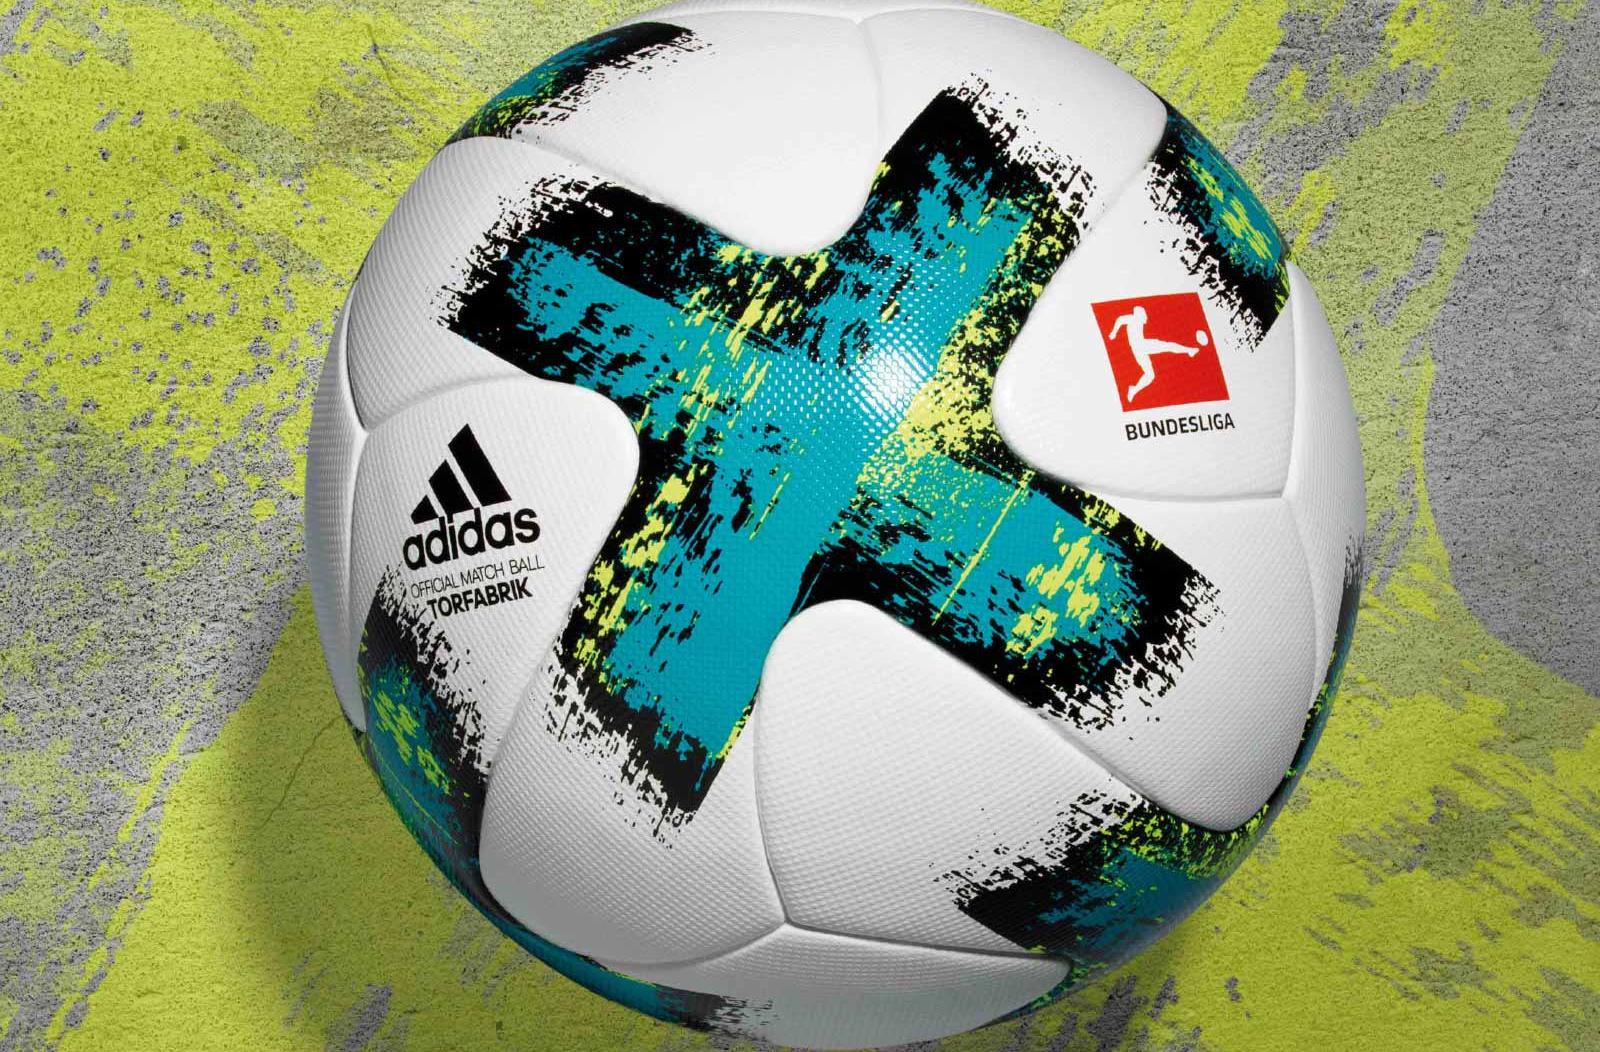 ce5a7a9fc39 Officiële adidas Bundesliga Torfabrik voetbal 2017 - Voetbalshirts.com